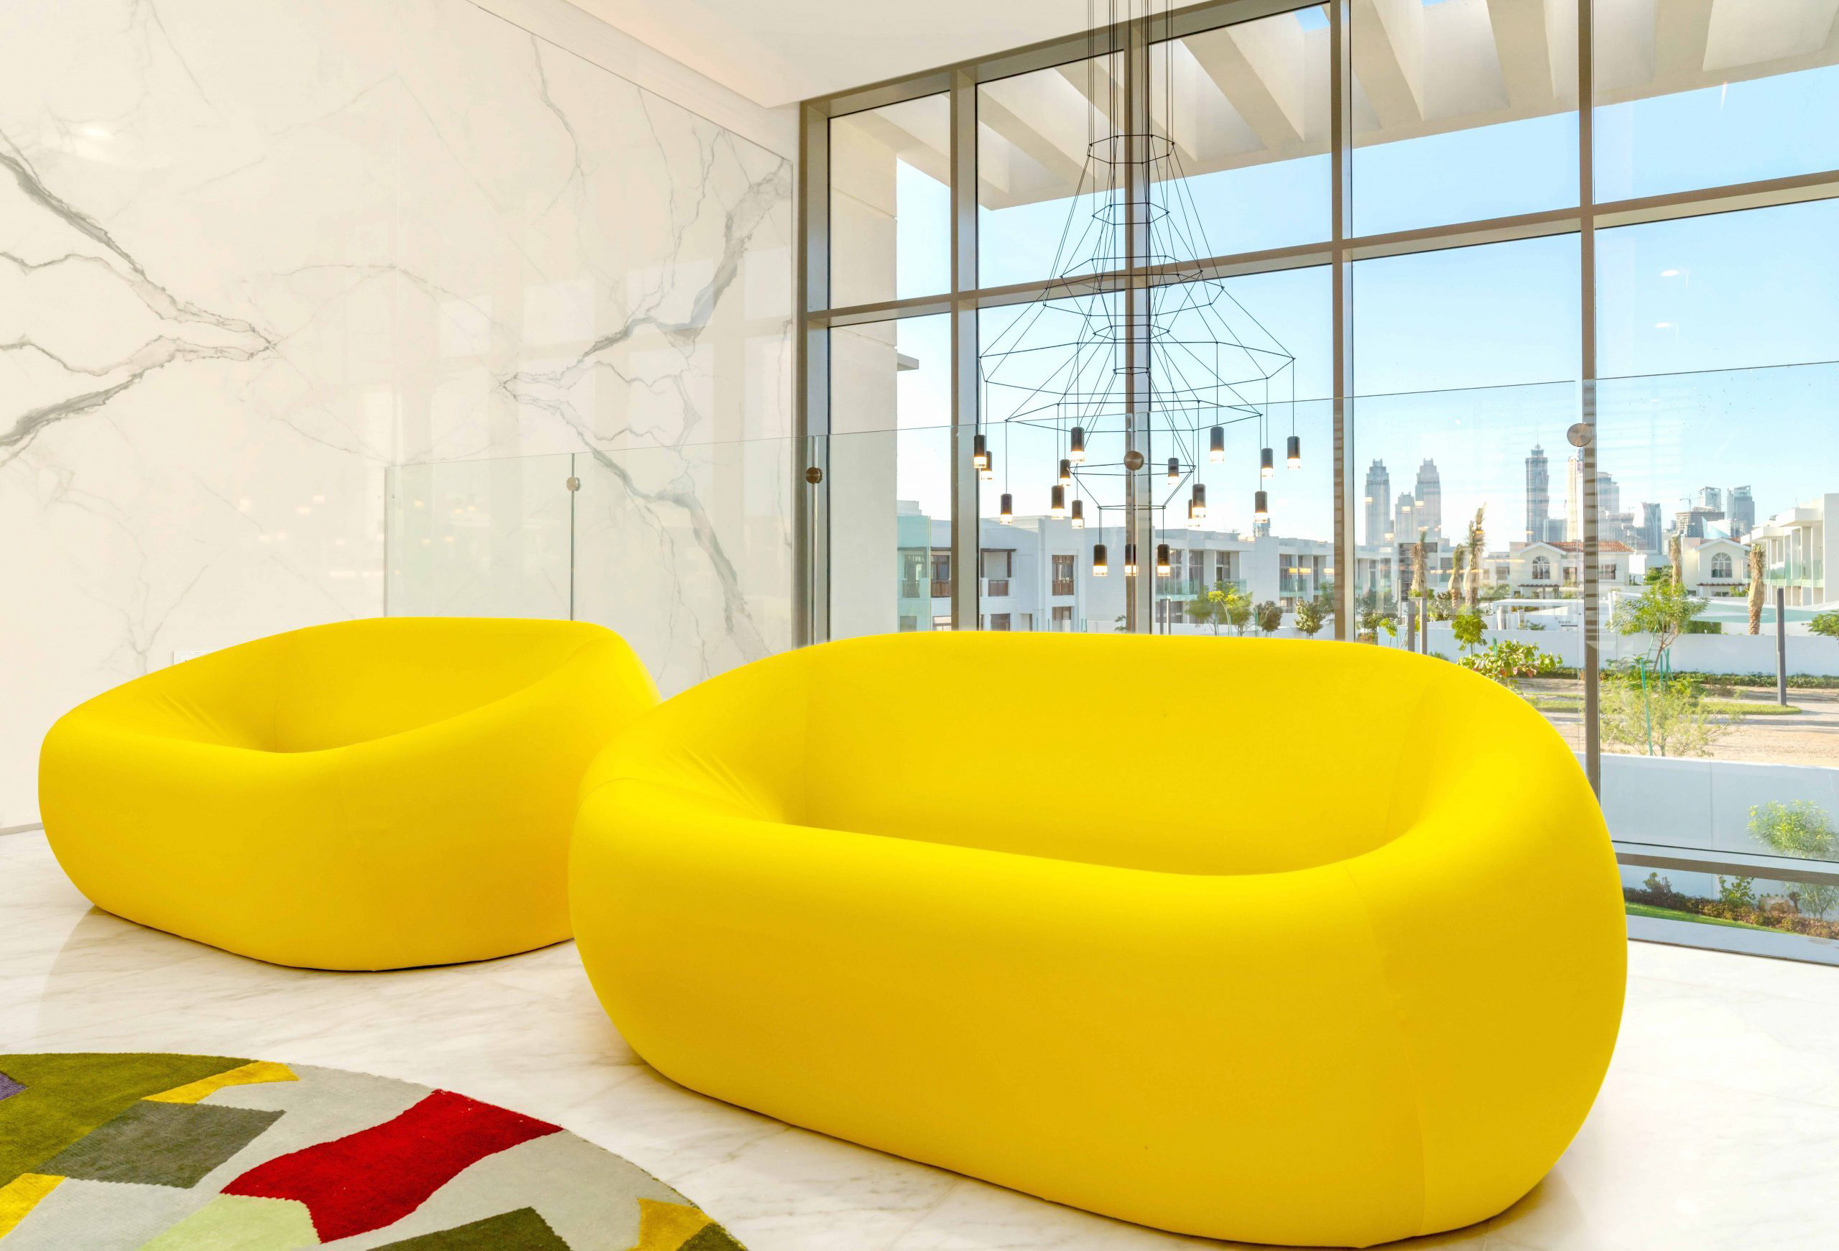 Mediterranean Luxury Villa – District One, Al Meydan, Dubai, UAE